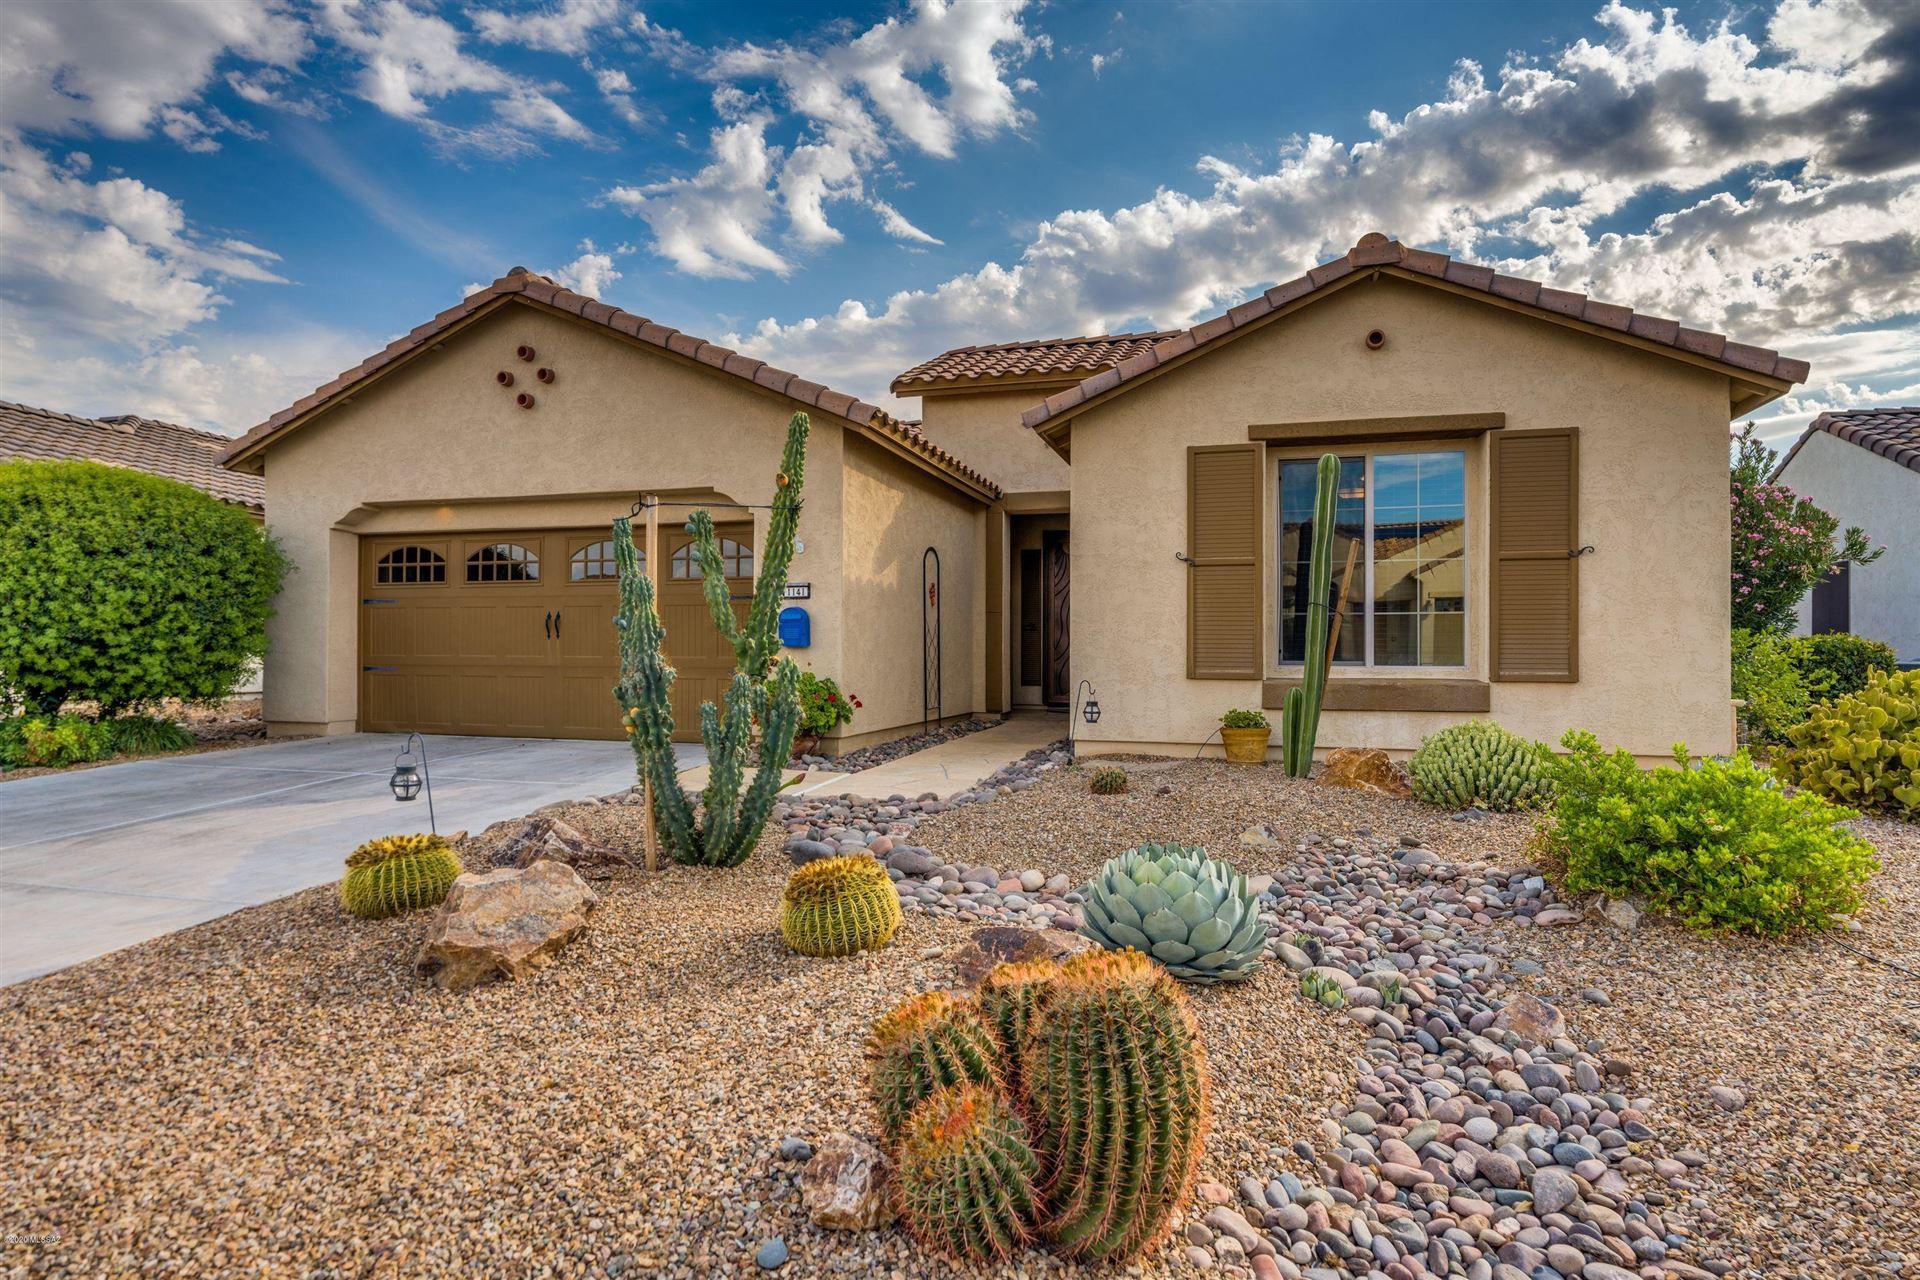 1141 N Night Heron Drive, Green Valley, AZ 85614 - MLS#: 22015903